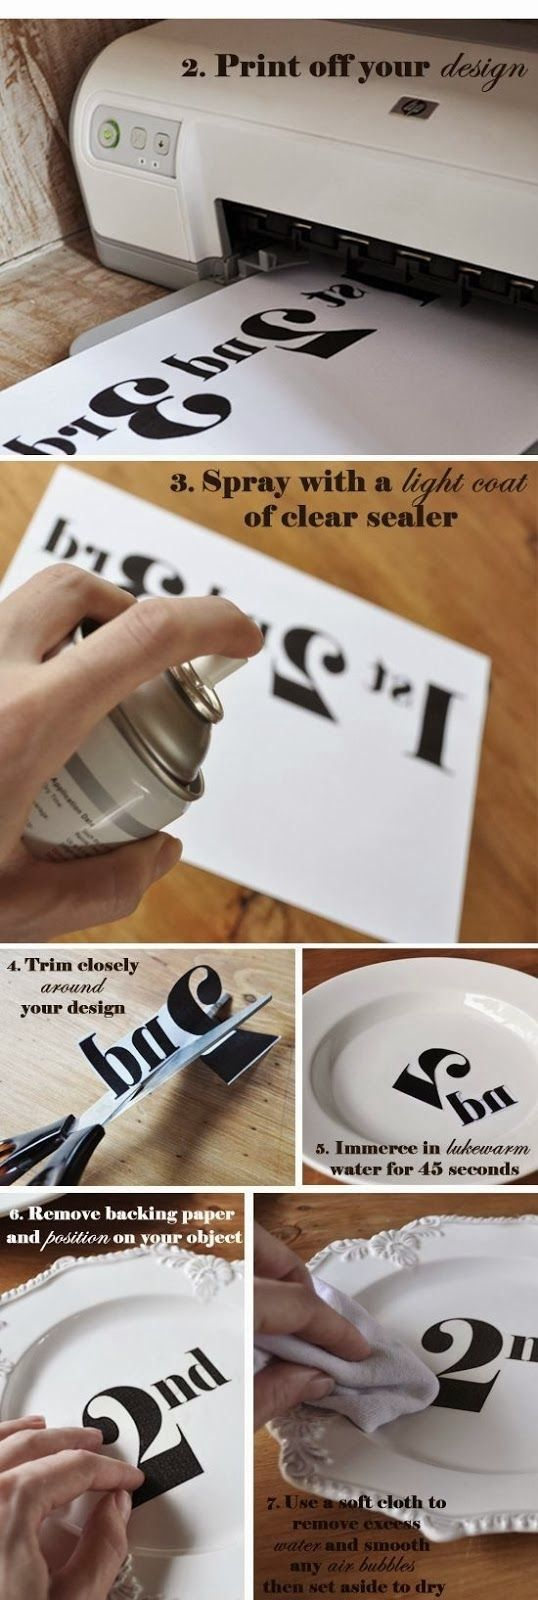 Imprime tu diseño #creatividad #diseño #impresión #capitaloffice